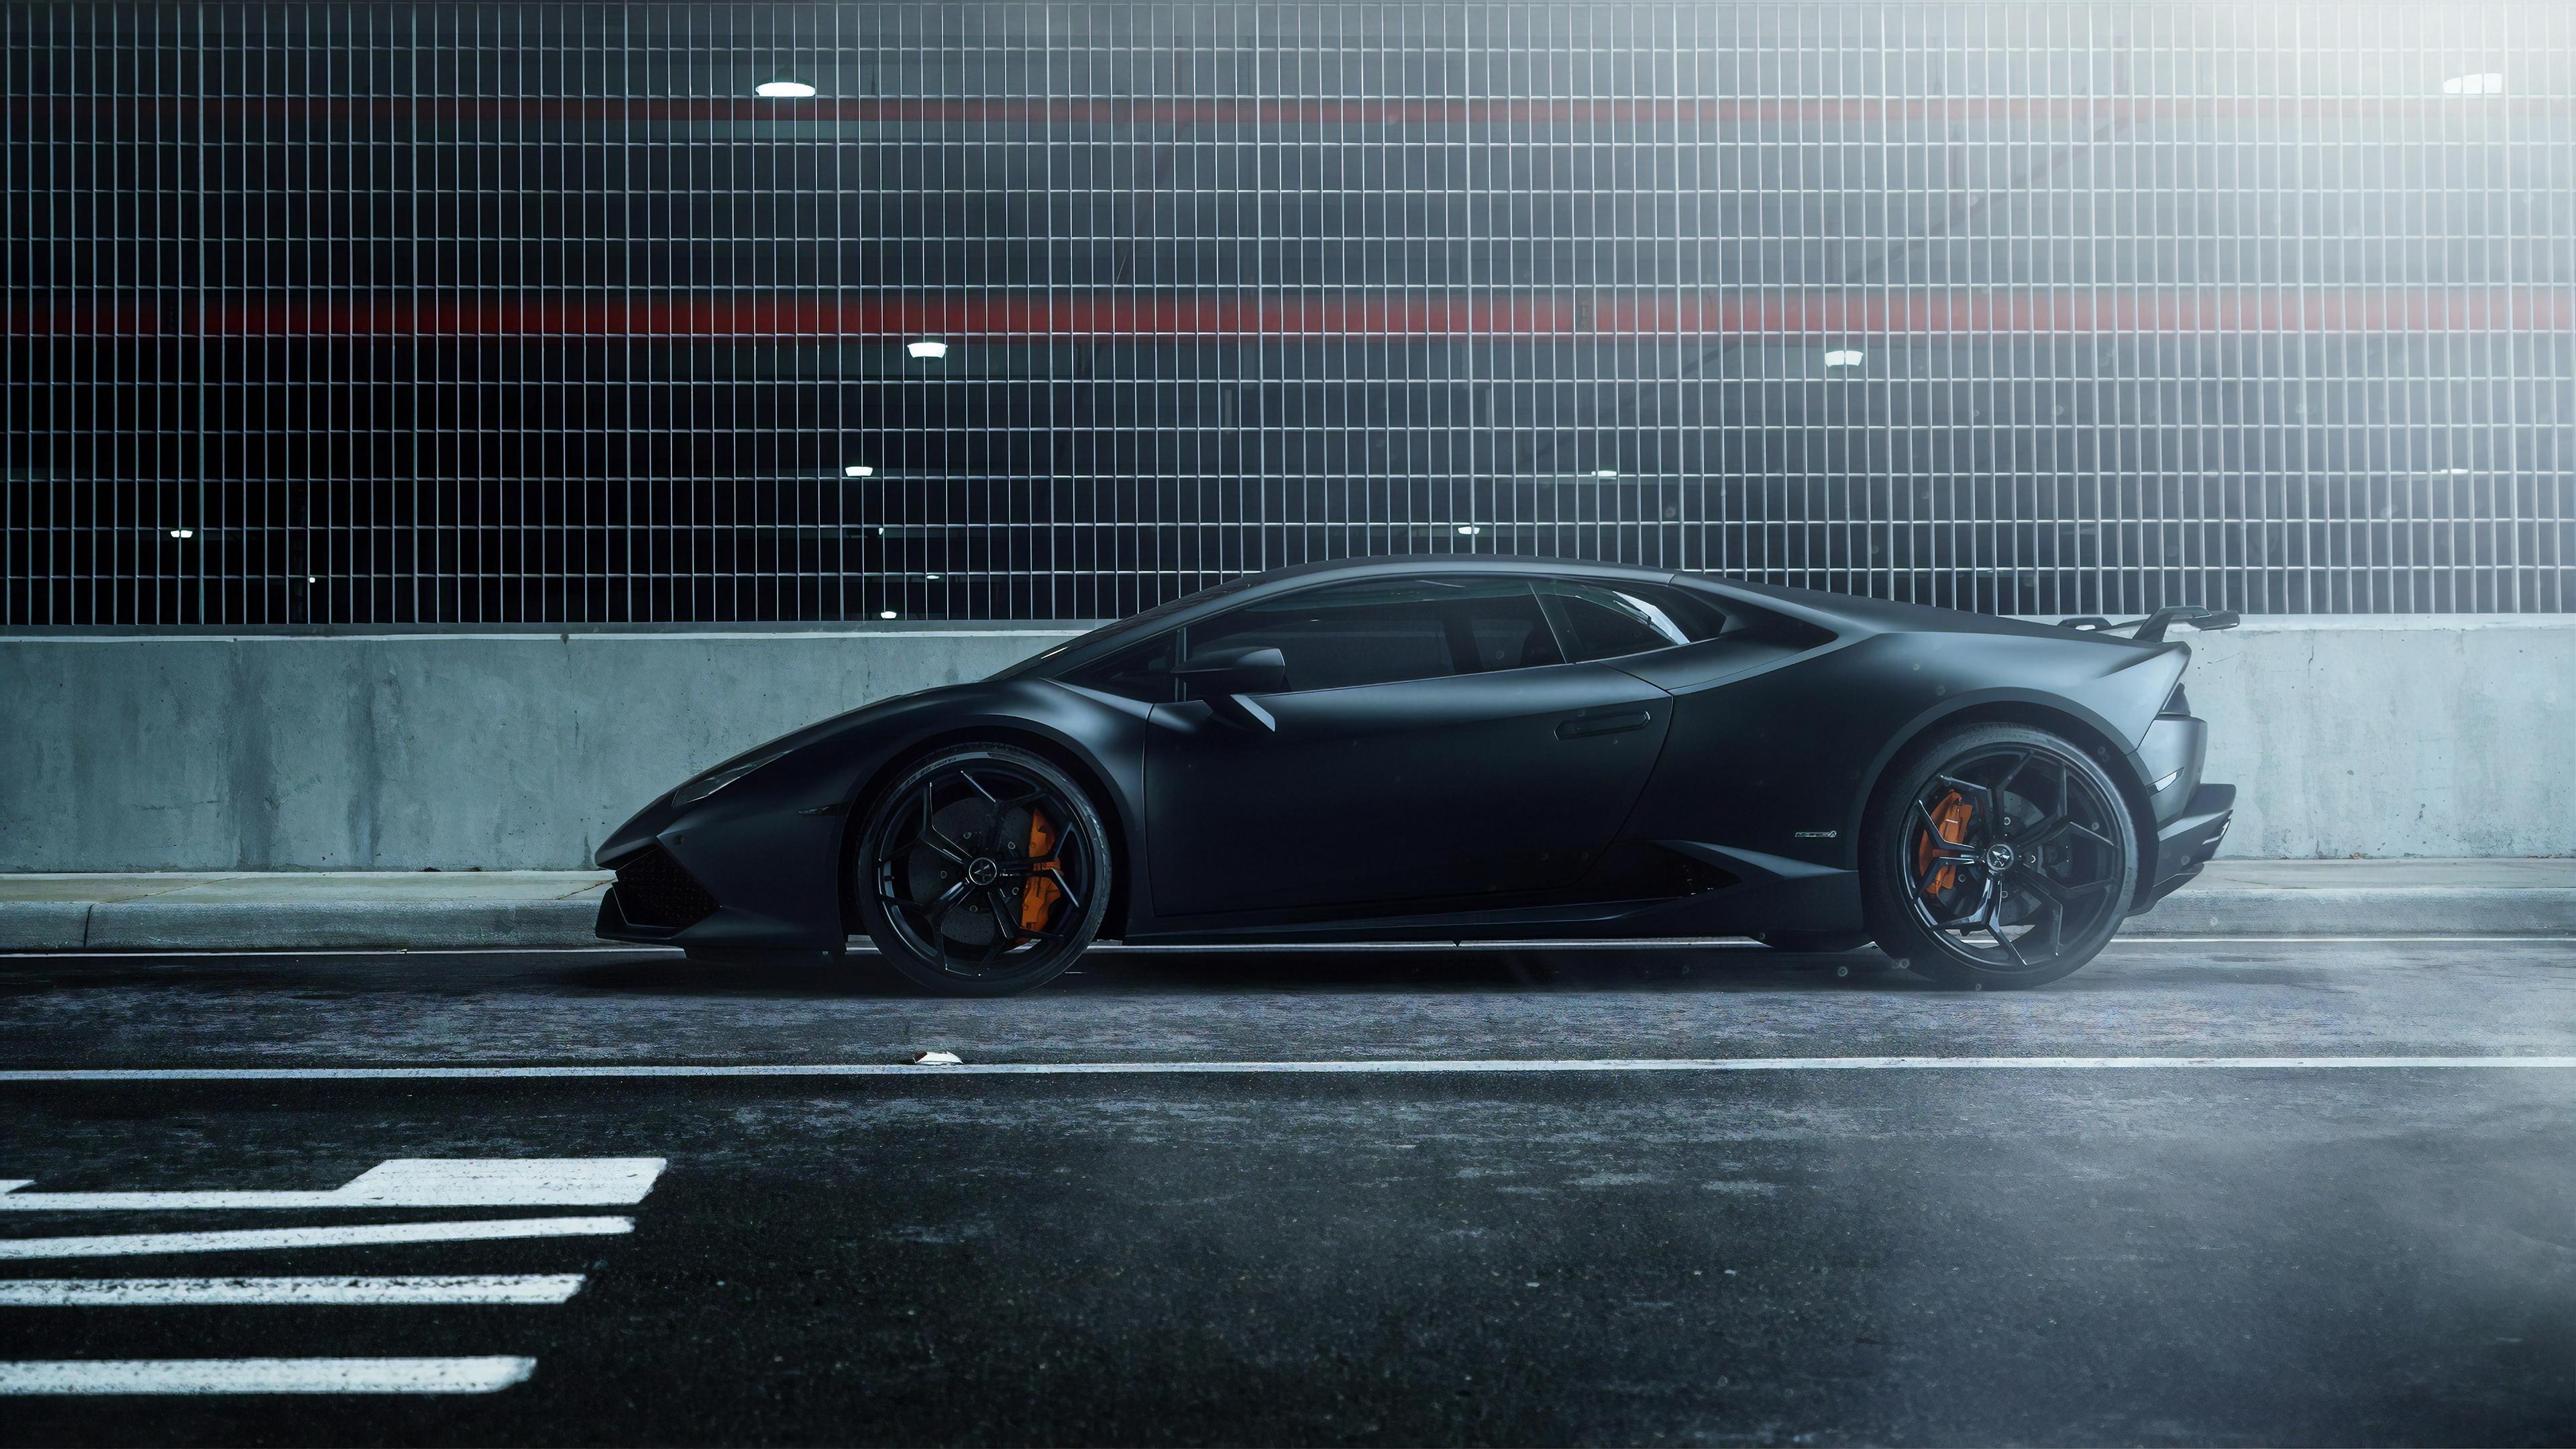 Lamborghini Huracan 4k Ultra Hd Wallpaper Background Image